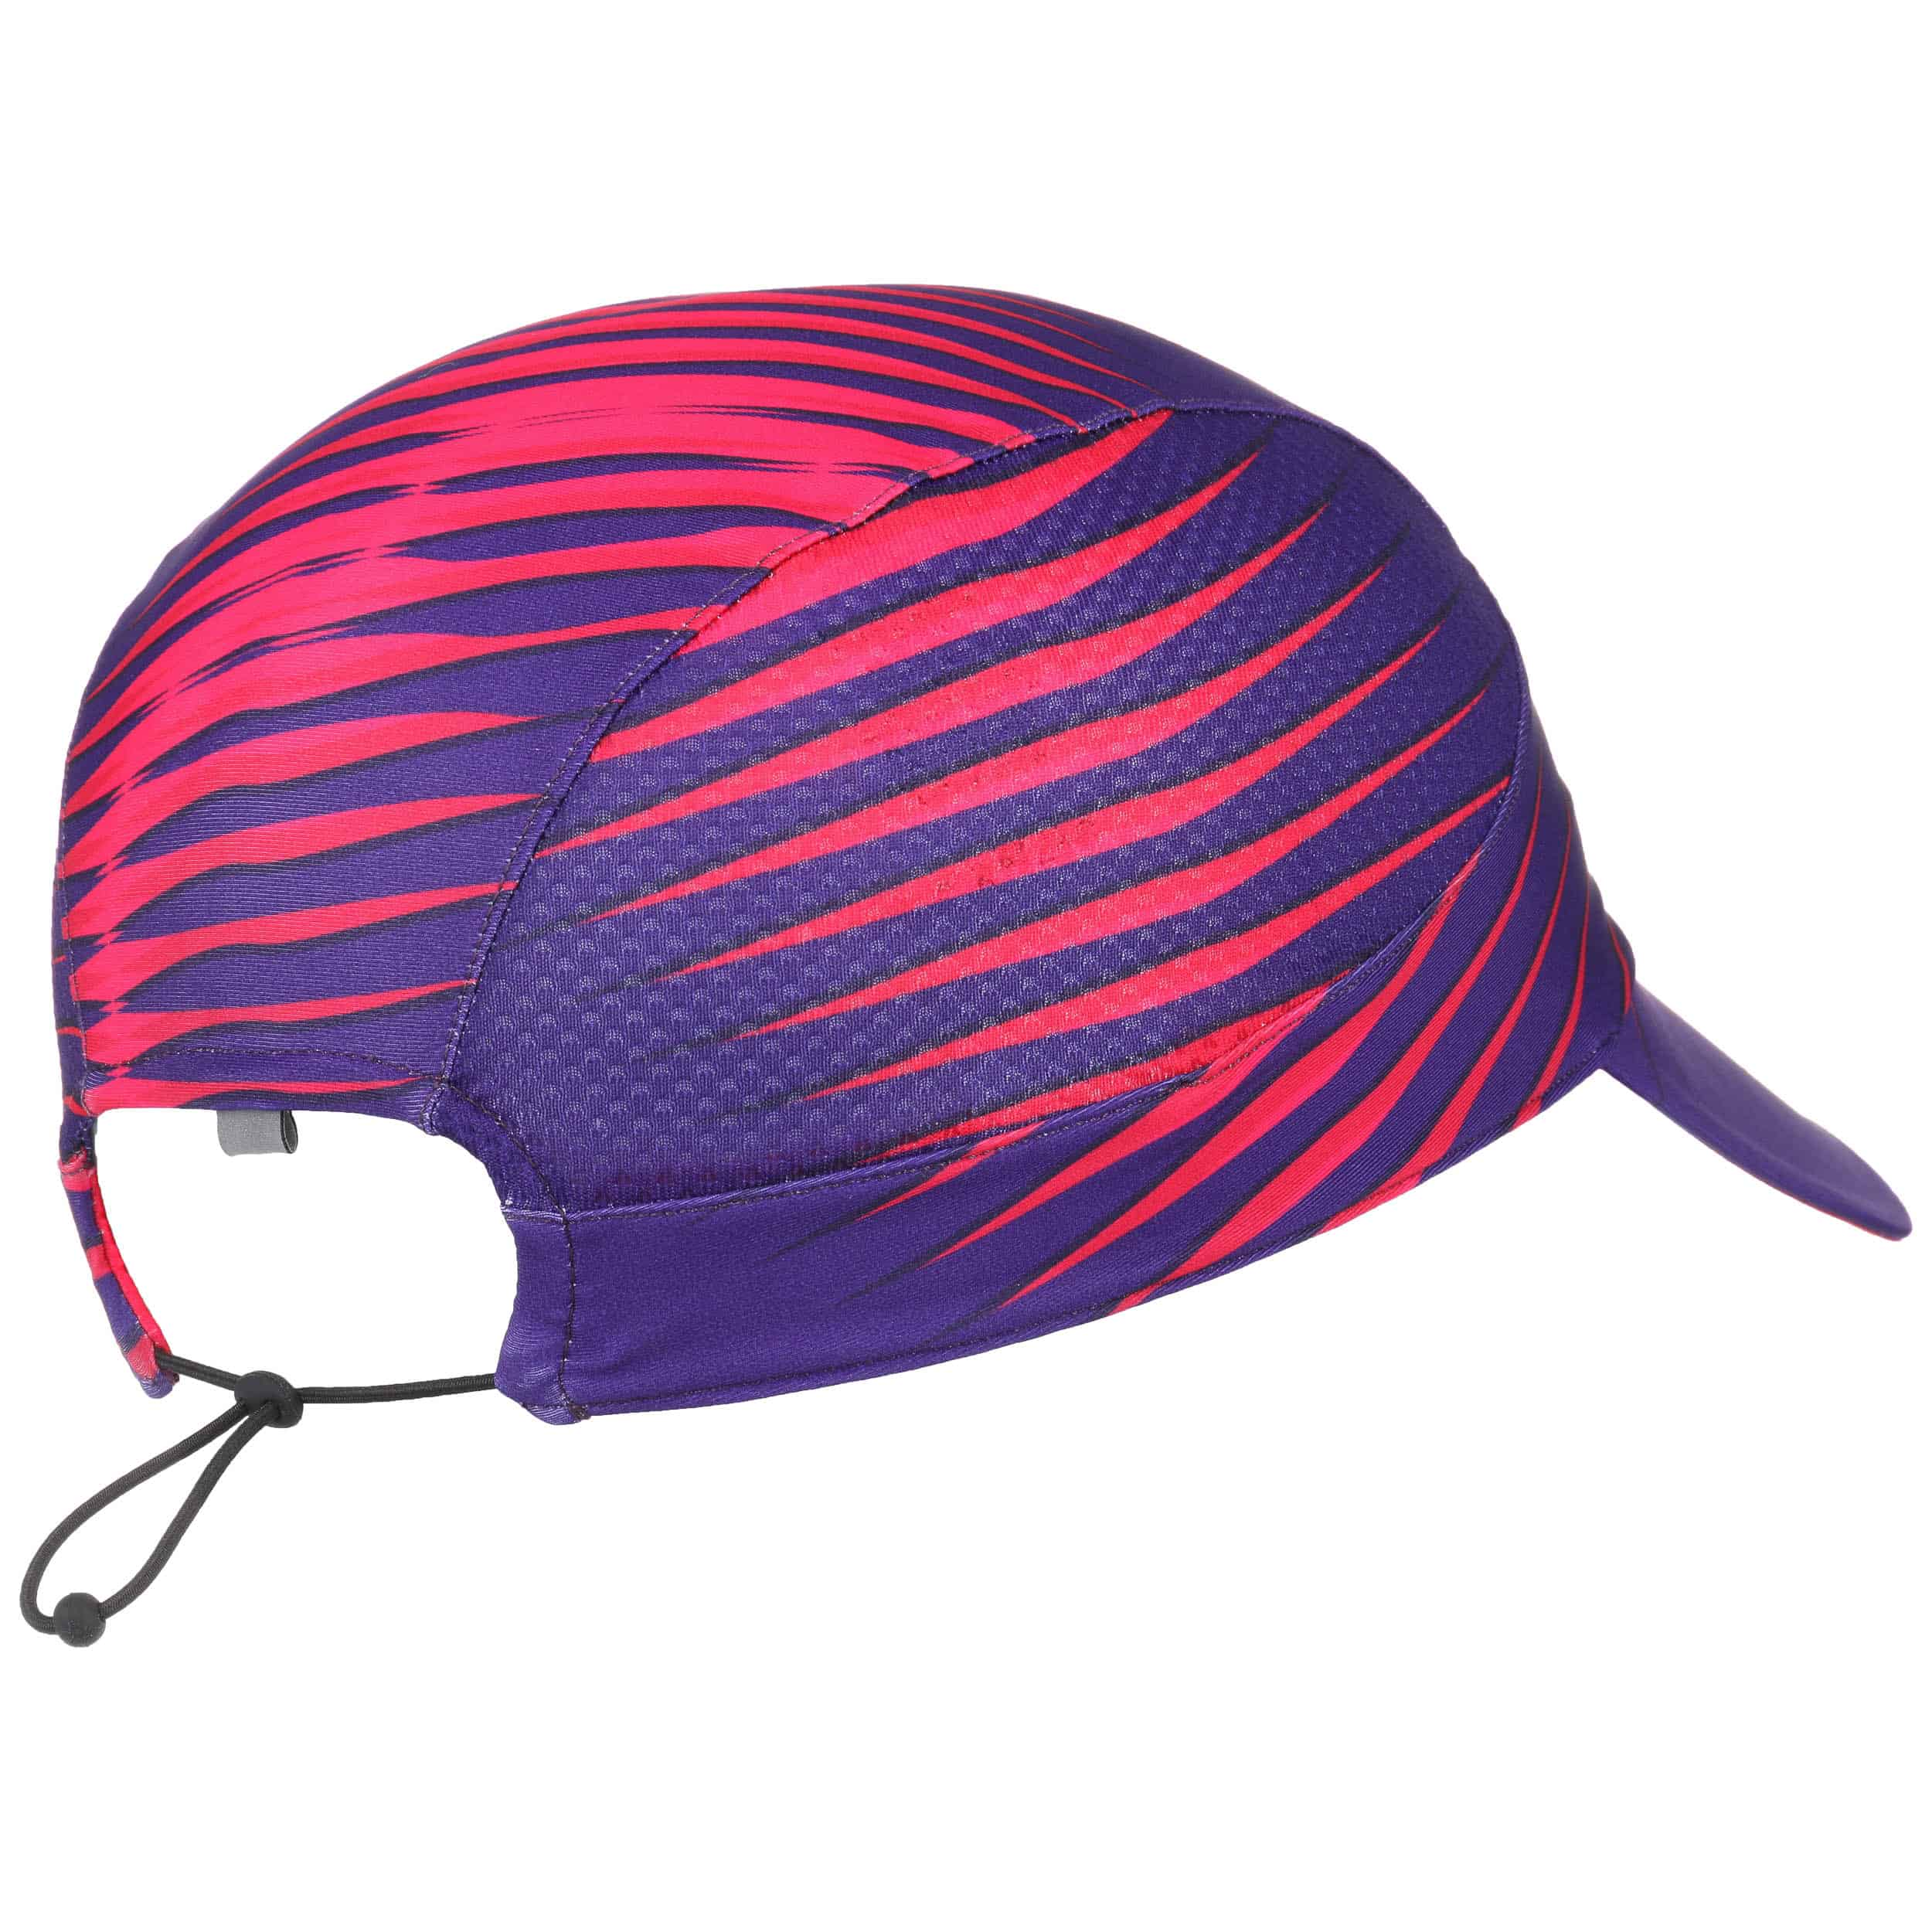 ... R-Optical Pink Pack Run Cap by BUFF - pink 3 ... 6706e68648